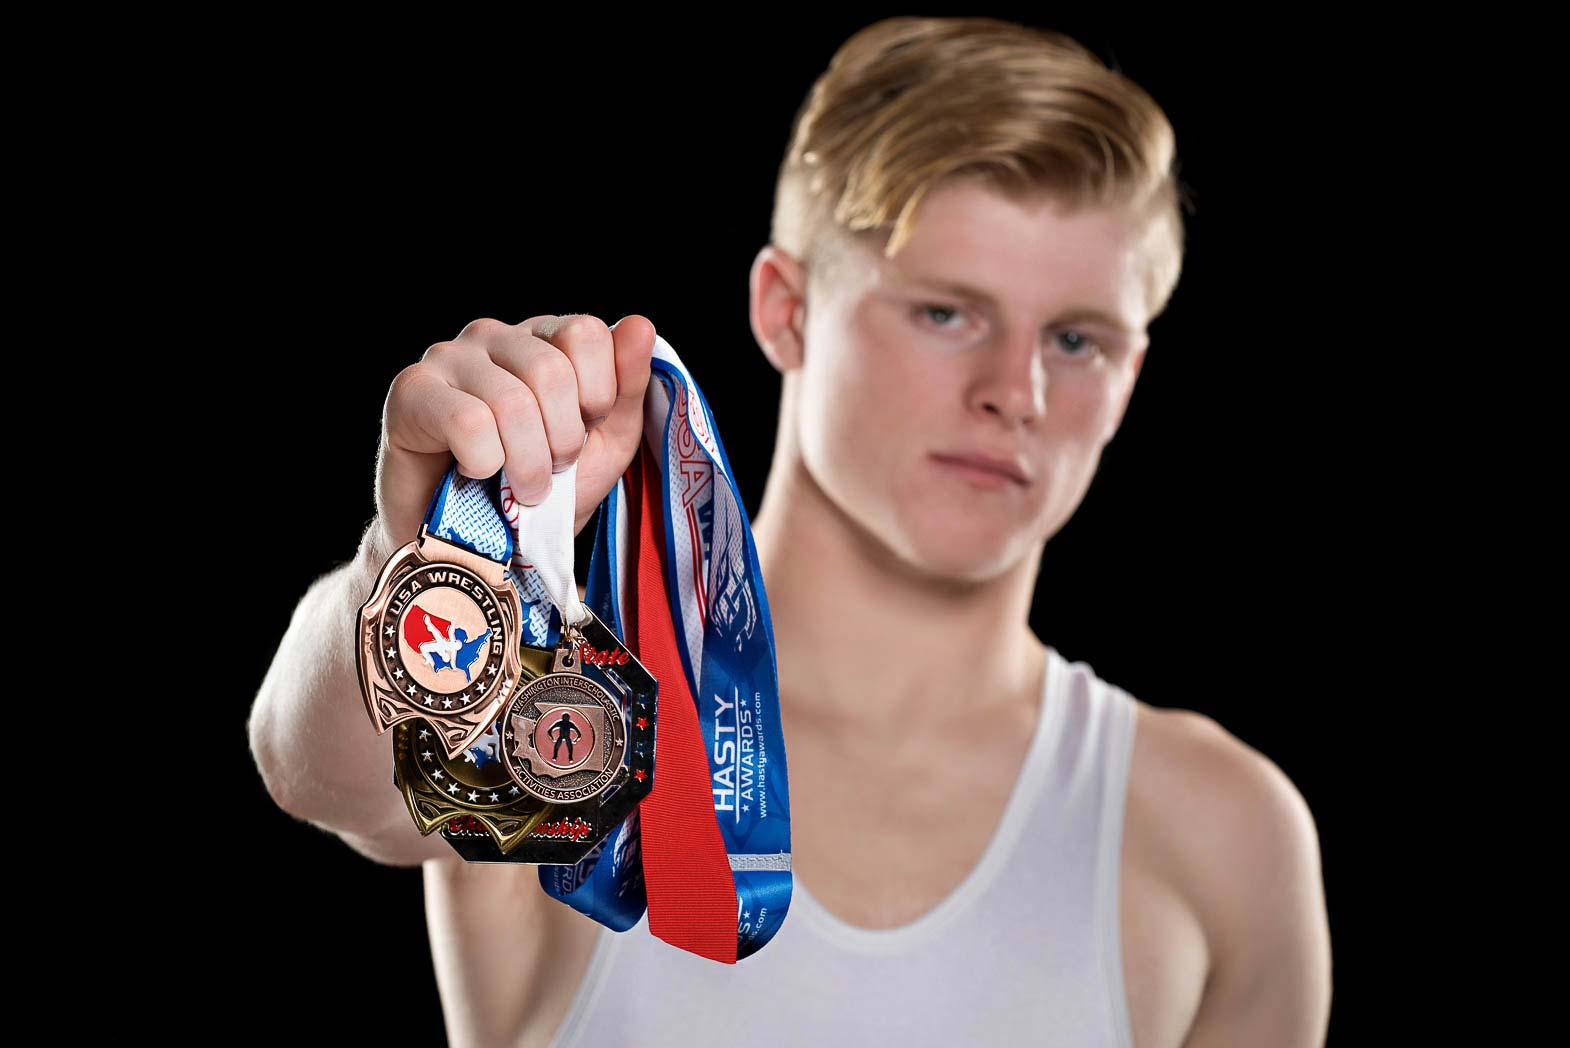 garrett-sports-senior-pictures-wrestling-awards-medals-studio-photonuvo